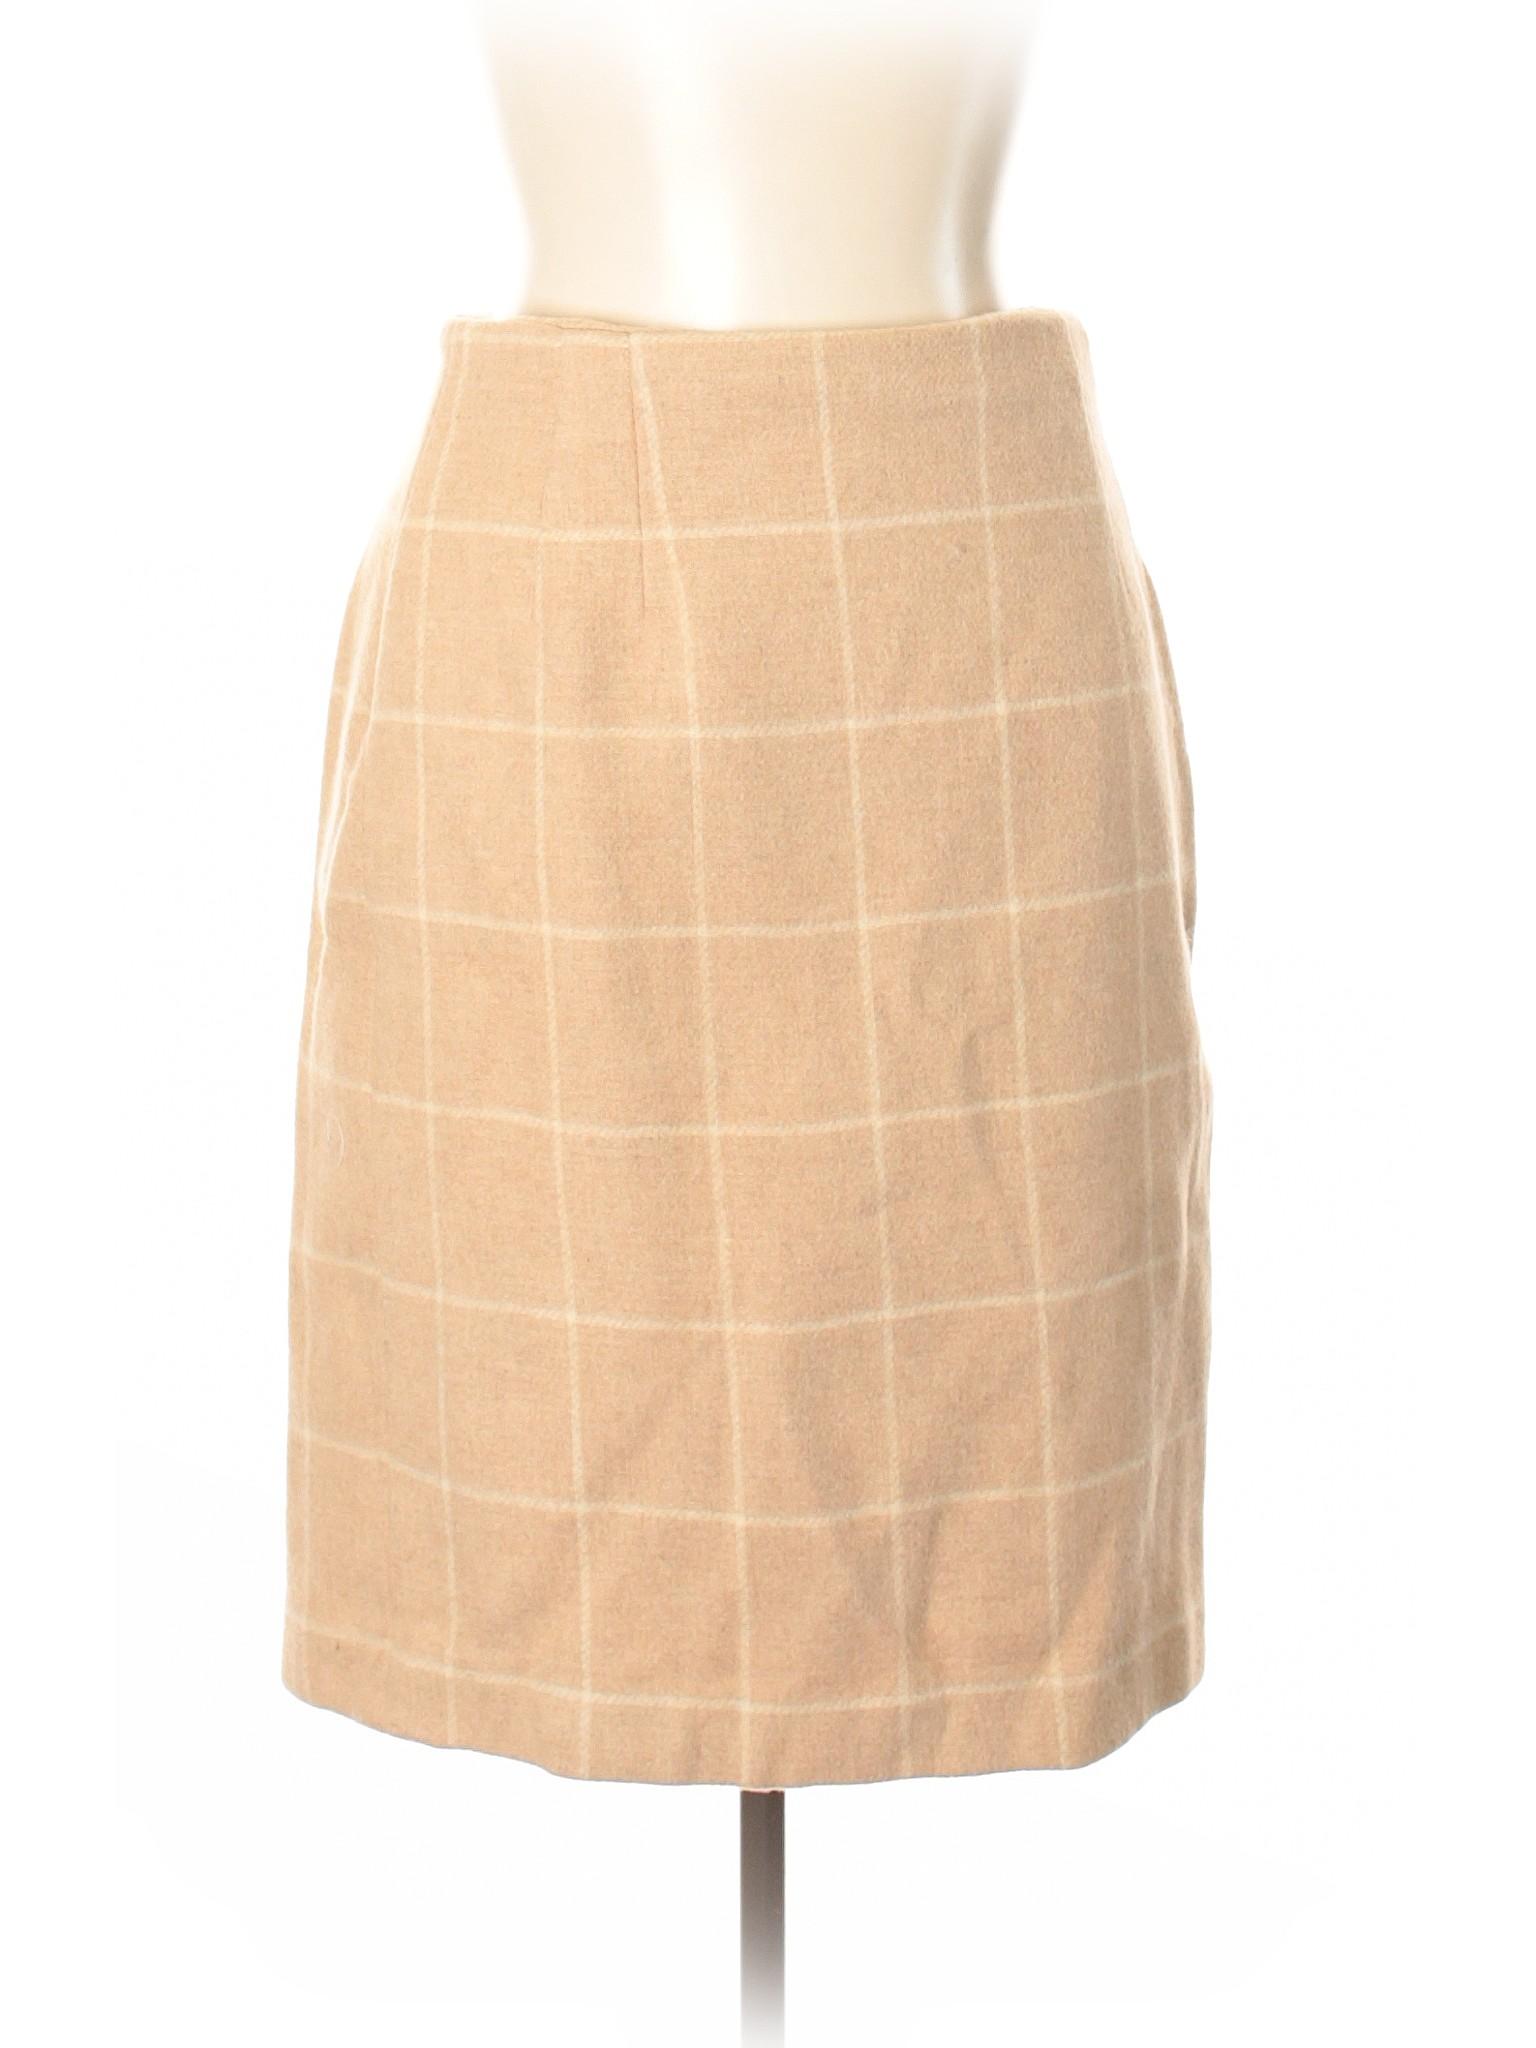 Boutique Skirt Wool Skirt Boutique Skirt Wool Boutique Boutique Wool qBTFzw